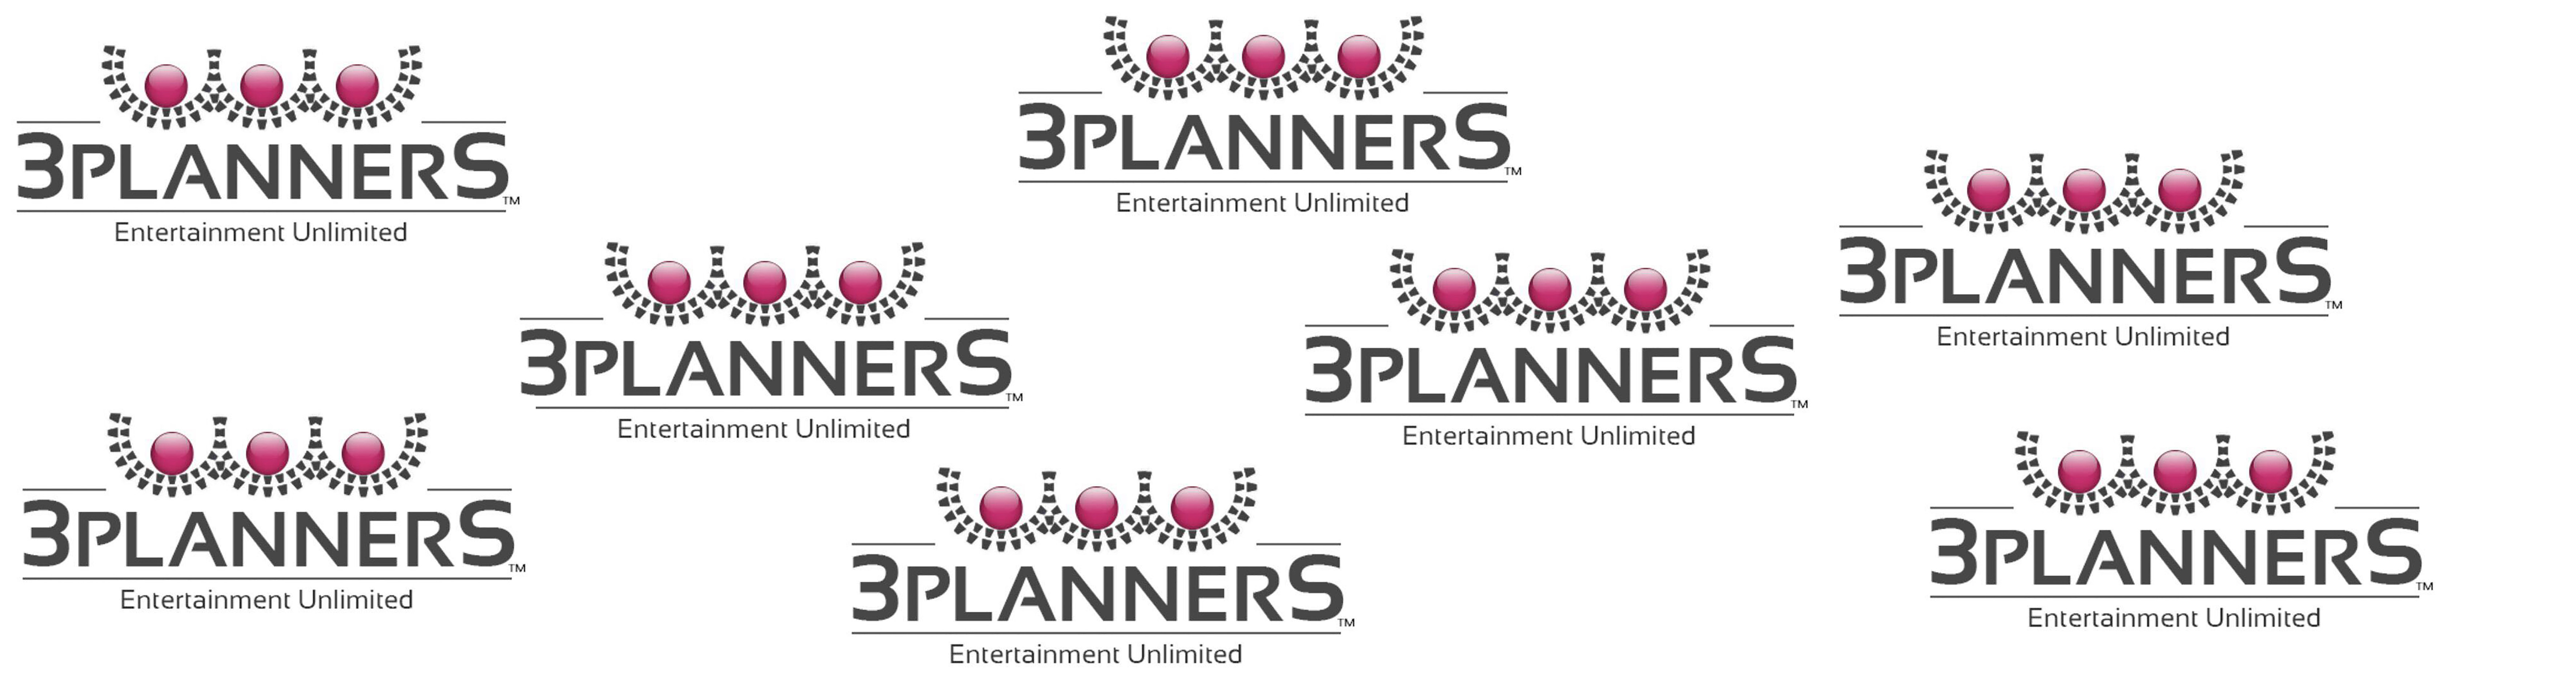 3PlannerS-multi-logo